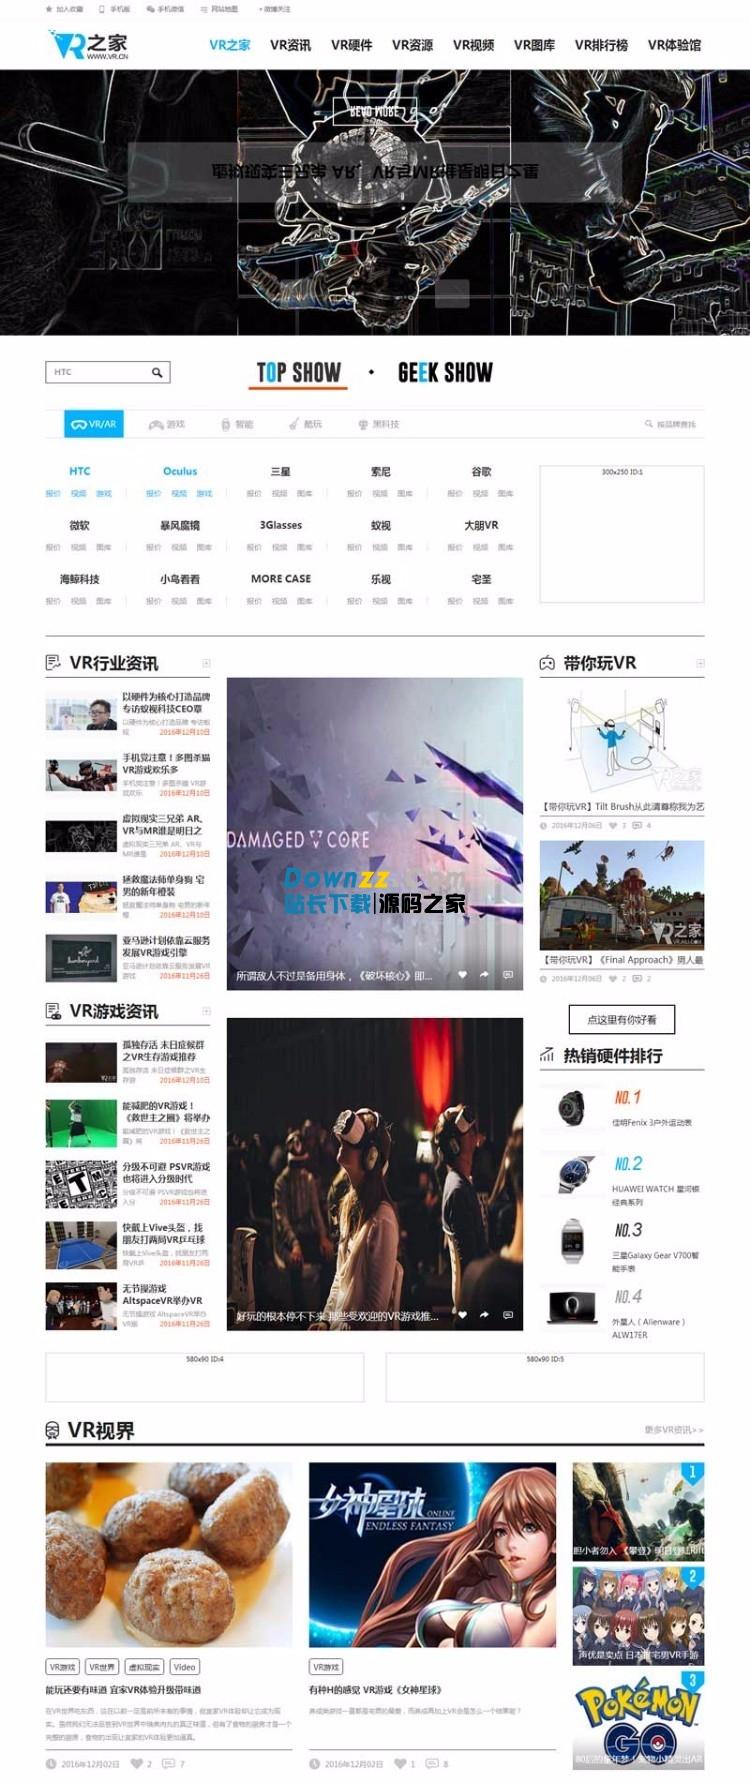 最新92kaifa帝国cms仿《VR之家》VR信息资源网整站源码